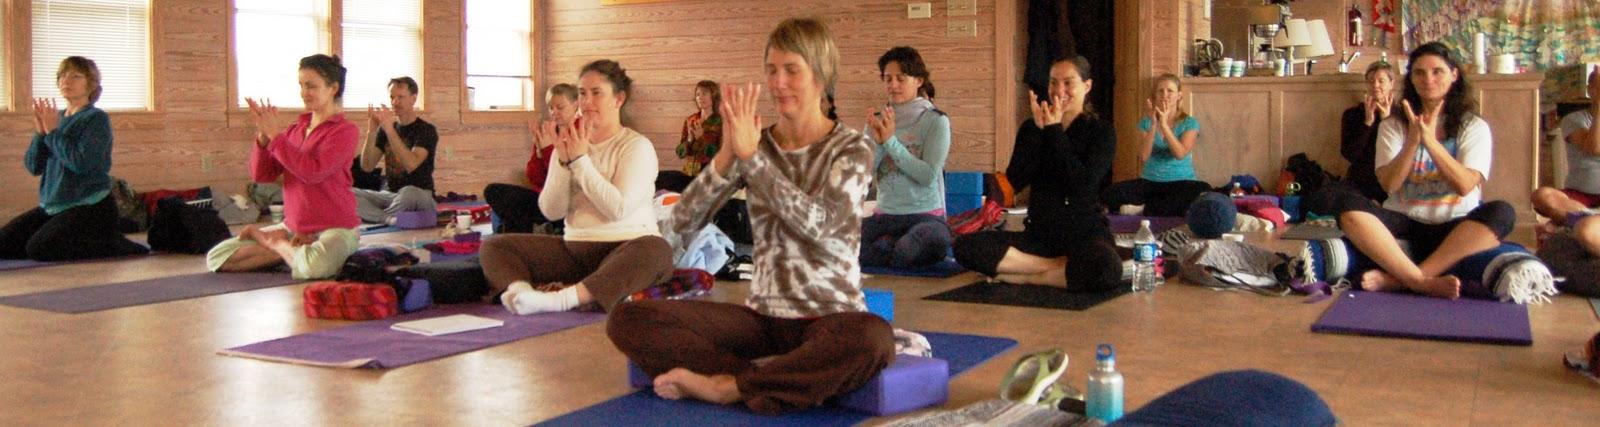 Ginger teaching yoga class